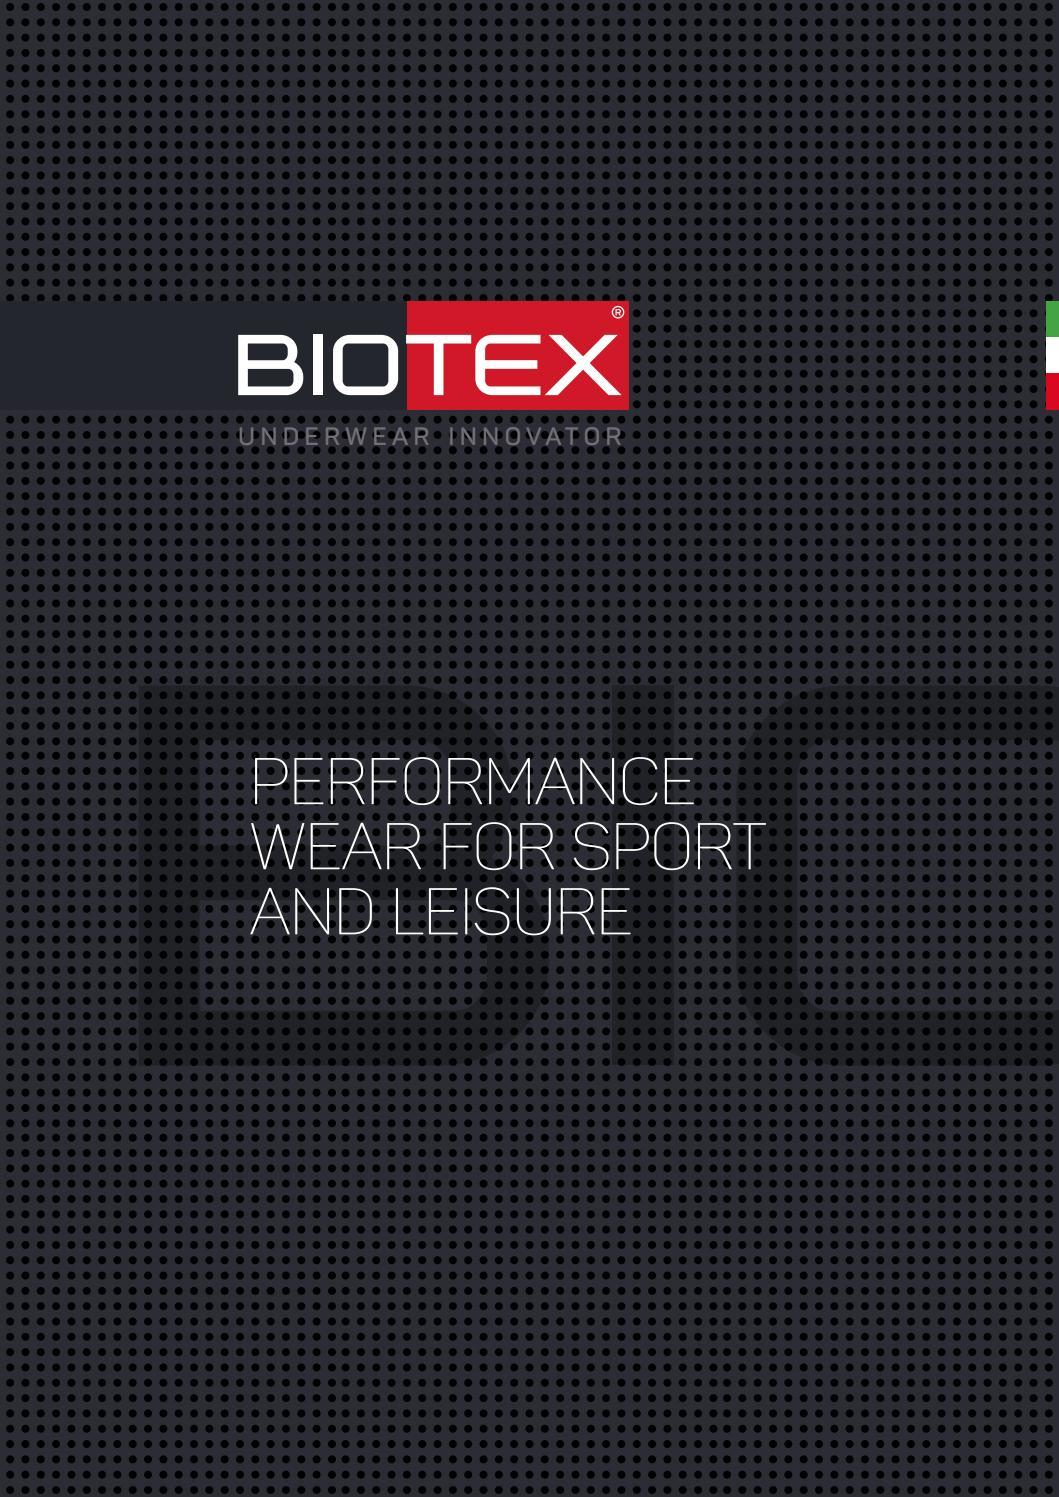 BIOTEX Manica Corta Ultra Uomo